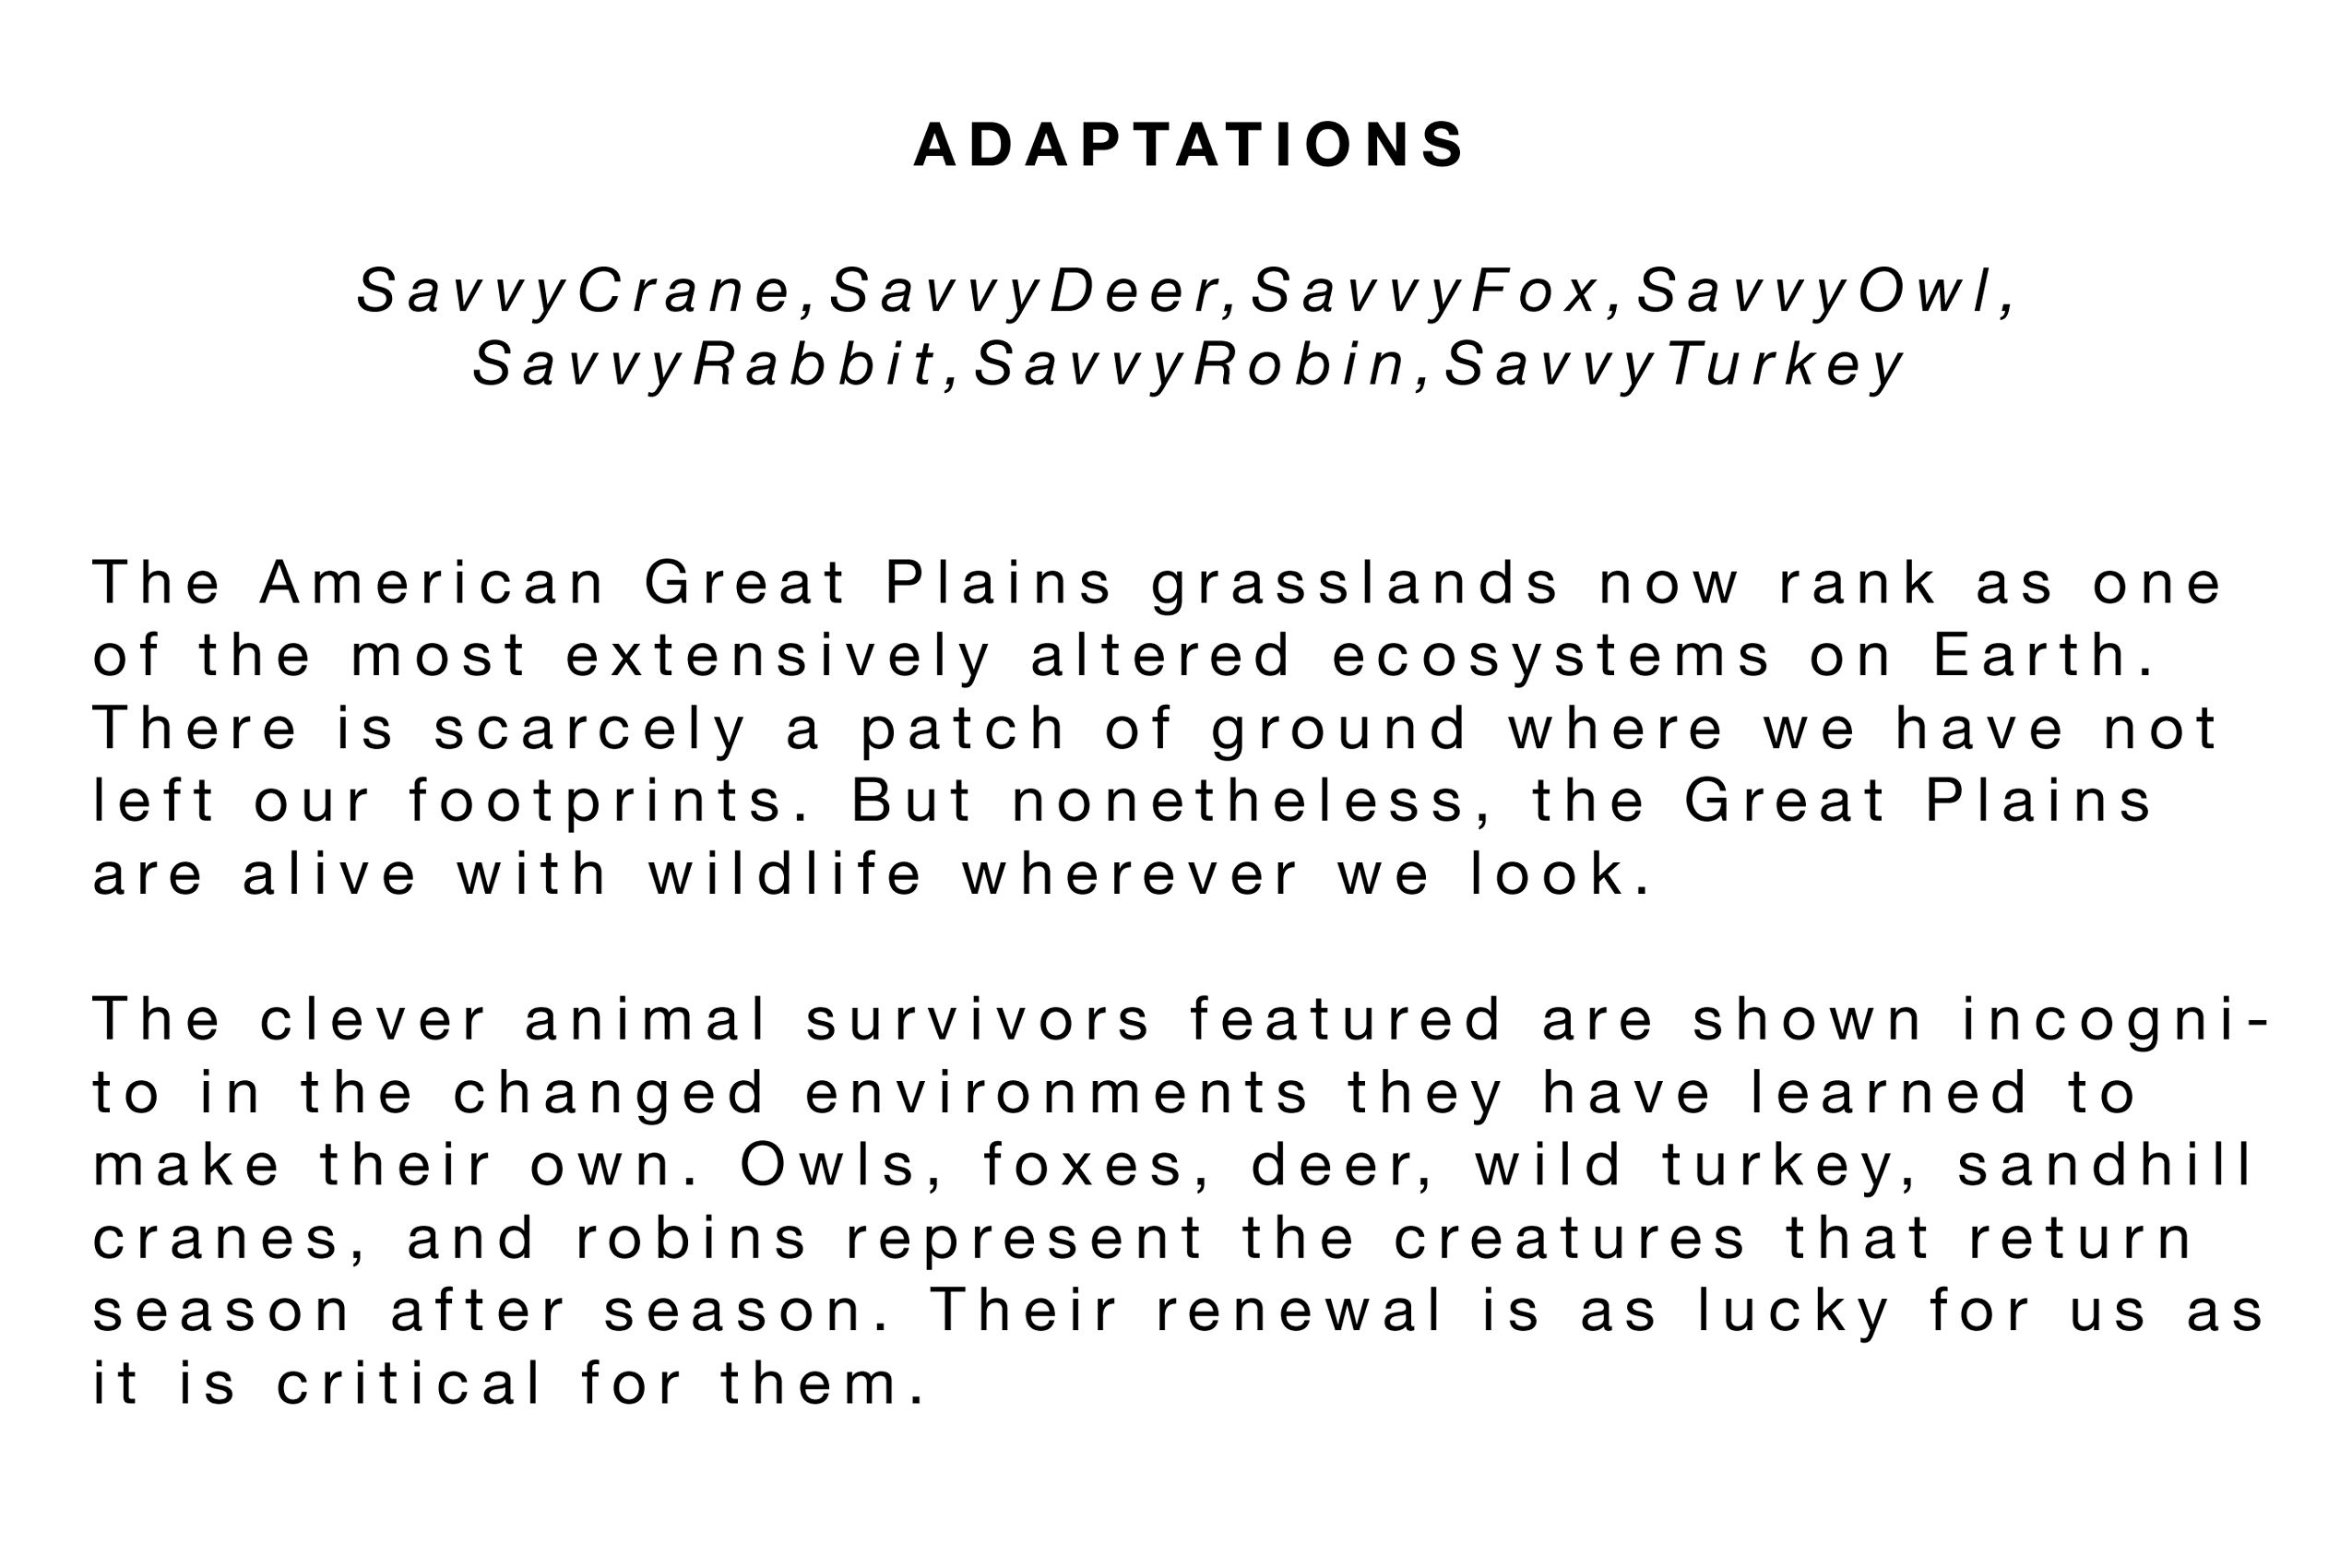 Adaptations Statement